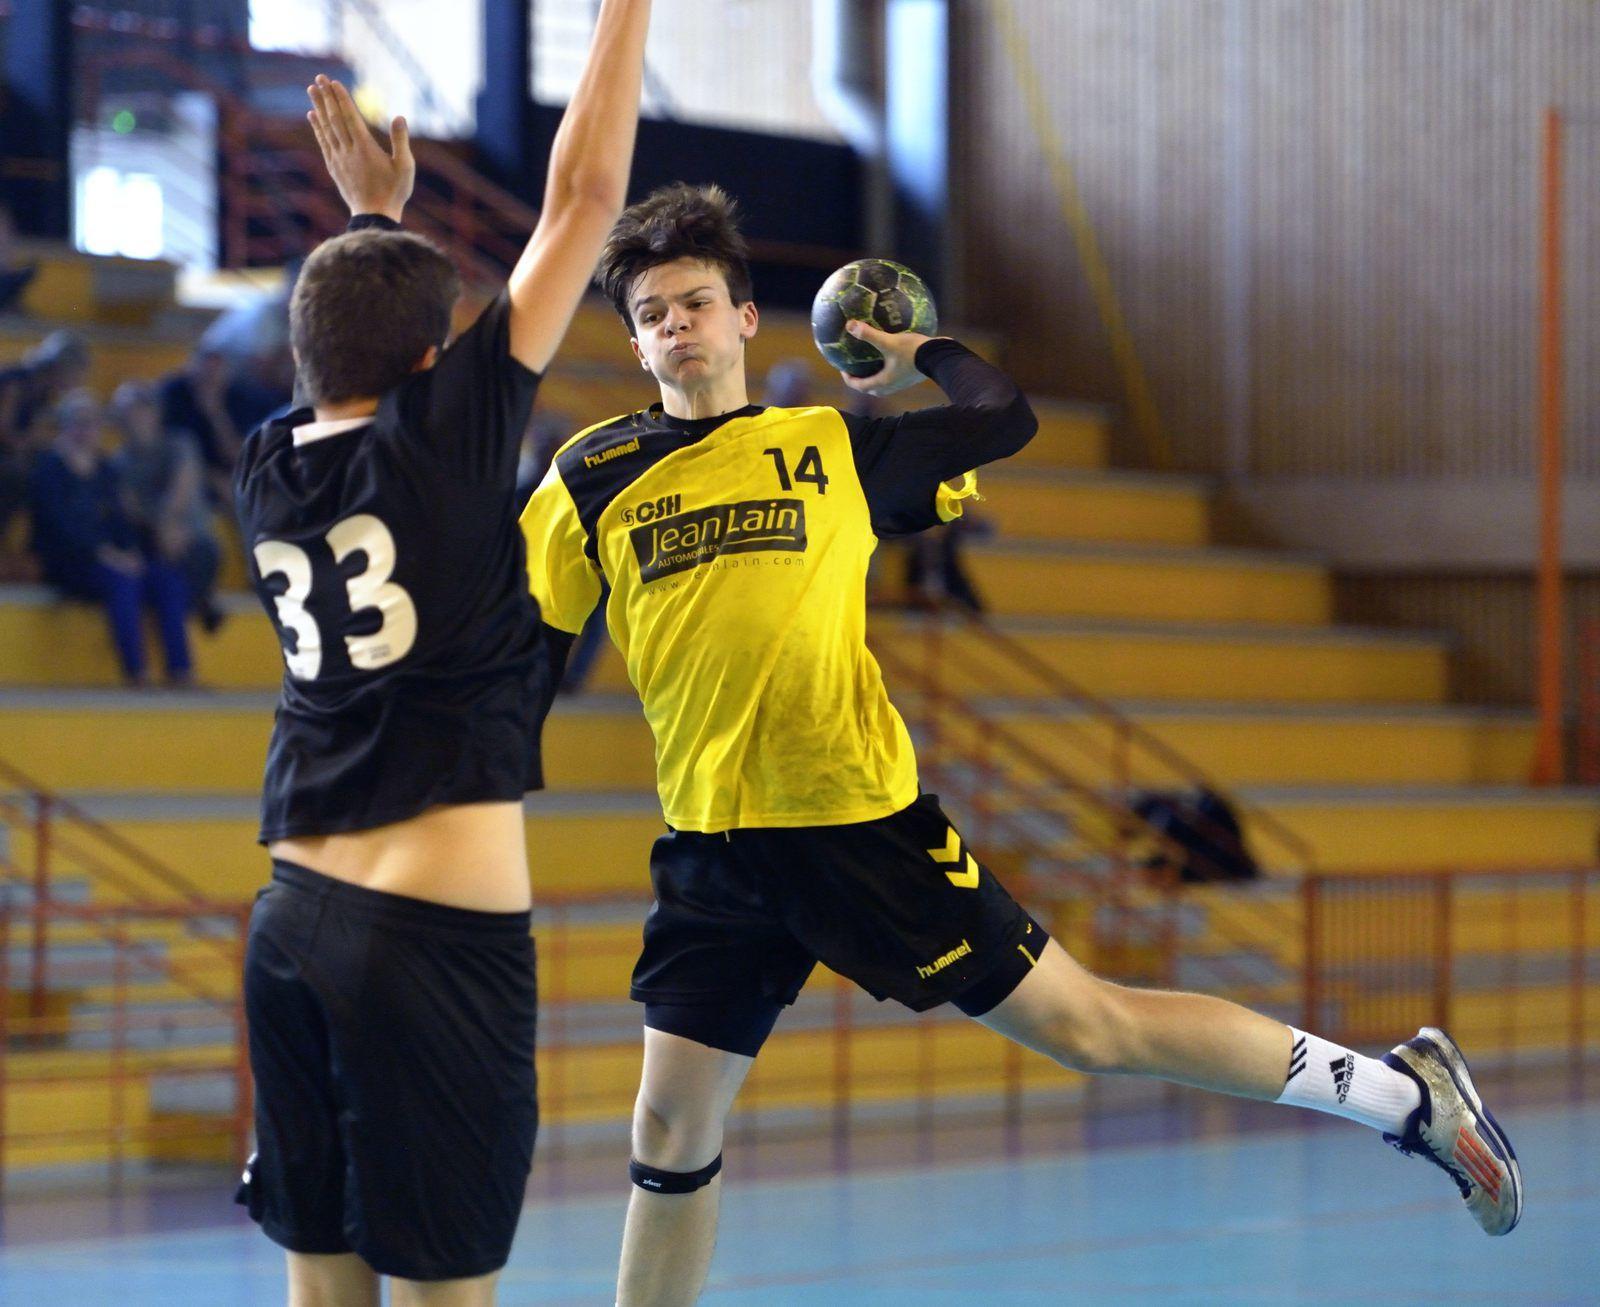 Les - 16 RA du CSH sont champions Rhône-Alpes 2015 - 2016